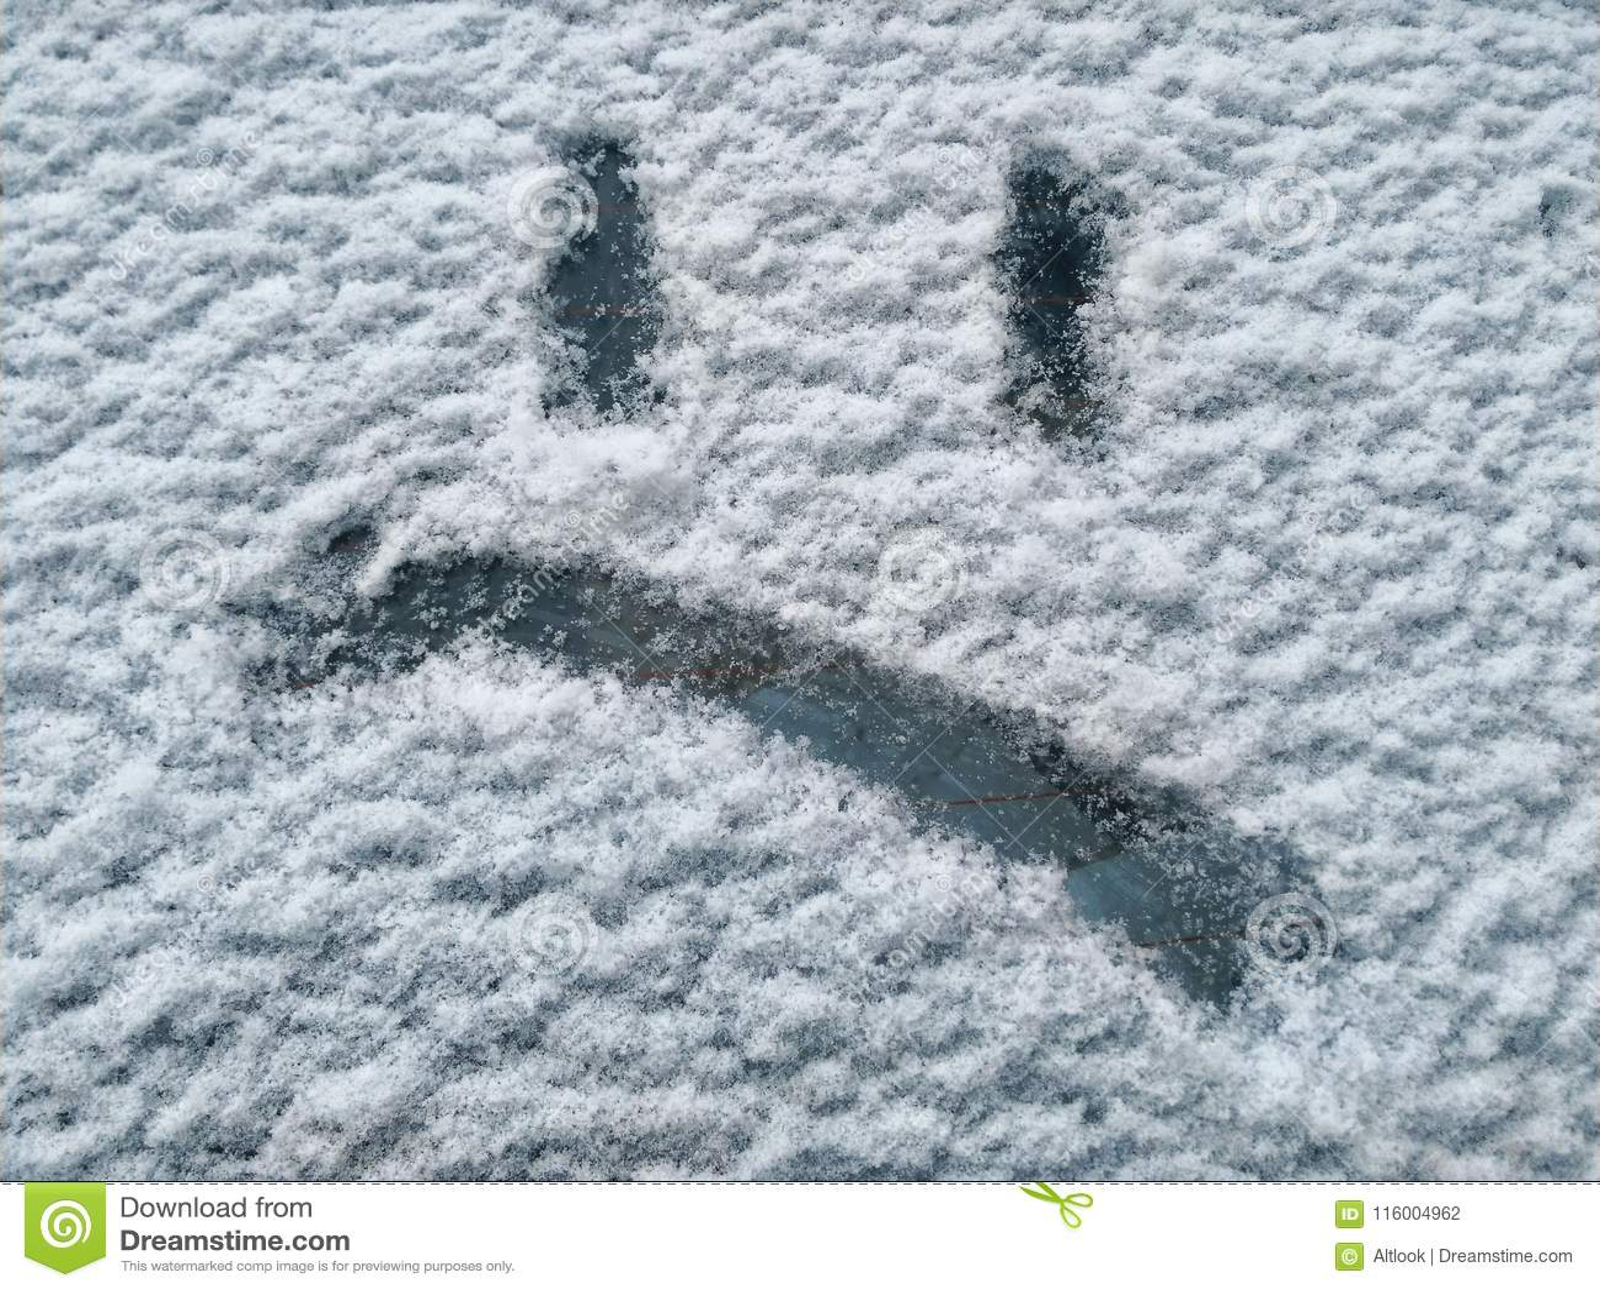 Emoji ha dipinto sulla neve: triste, arrabbiato